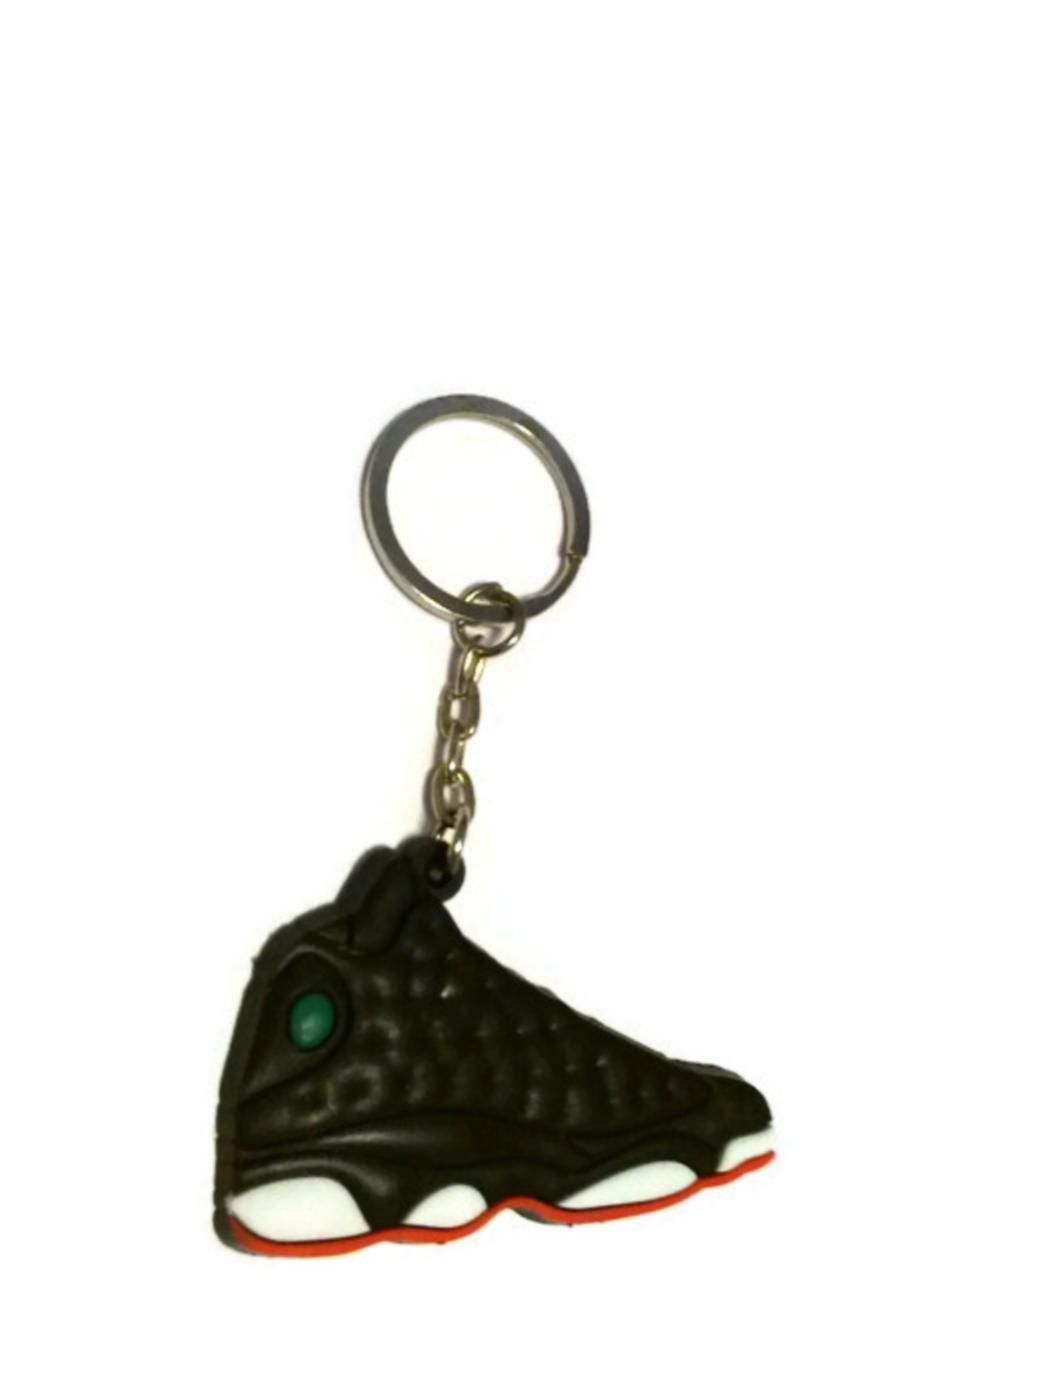 1 X Air Jordan Retro 13 Keychain (Black/White/Red)